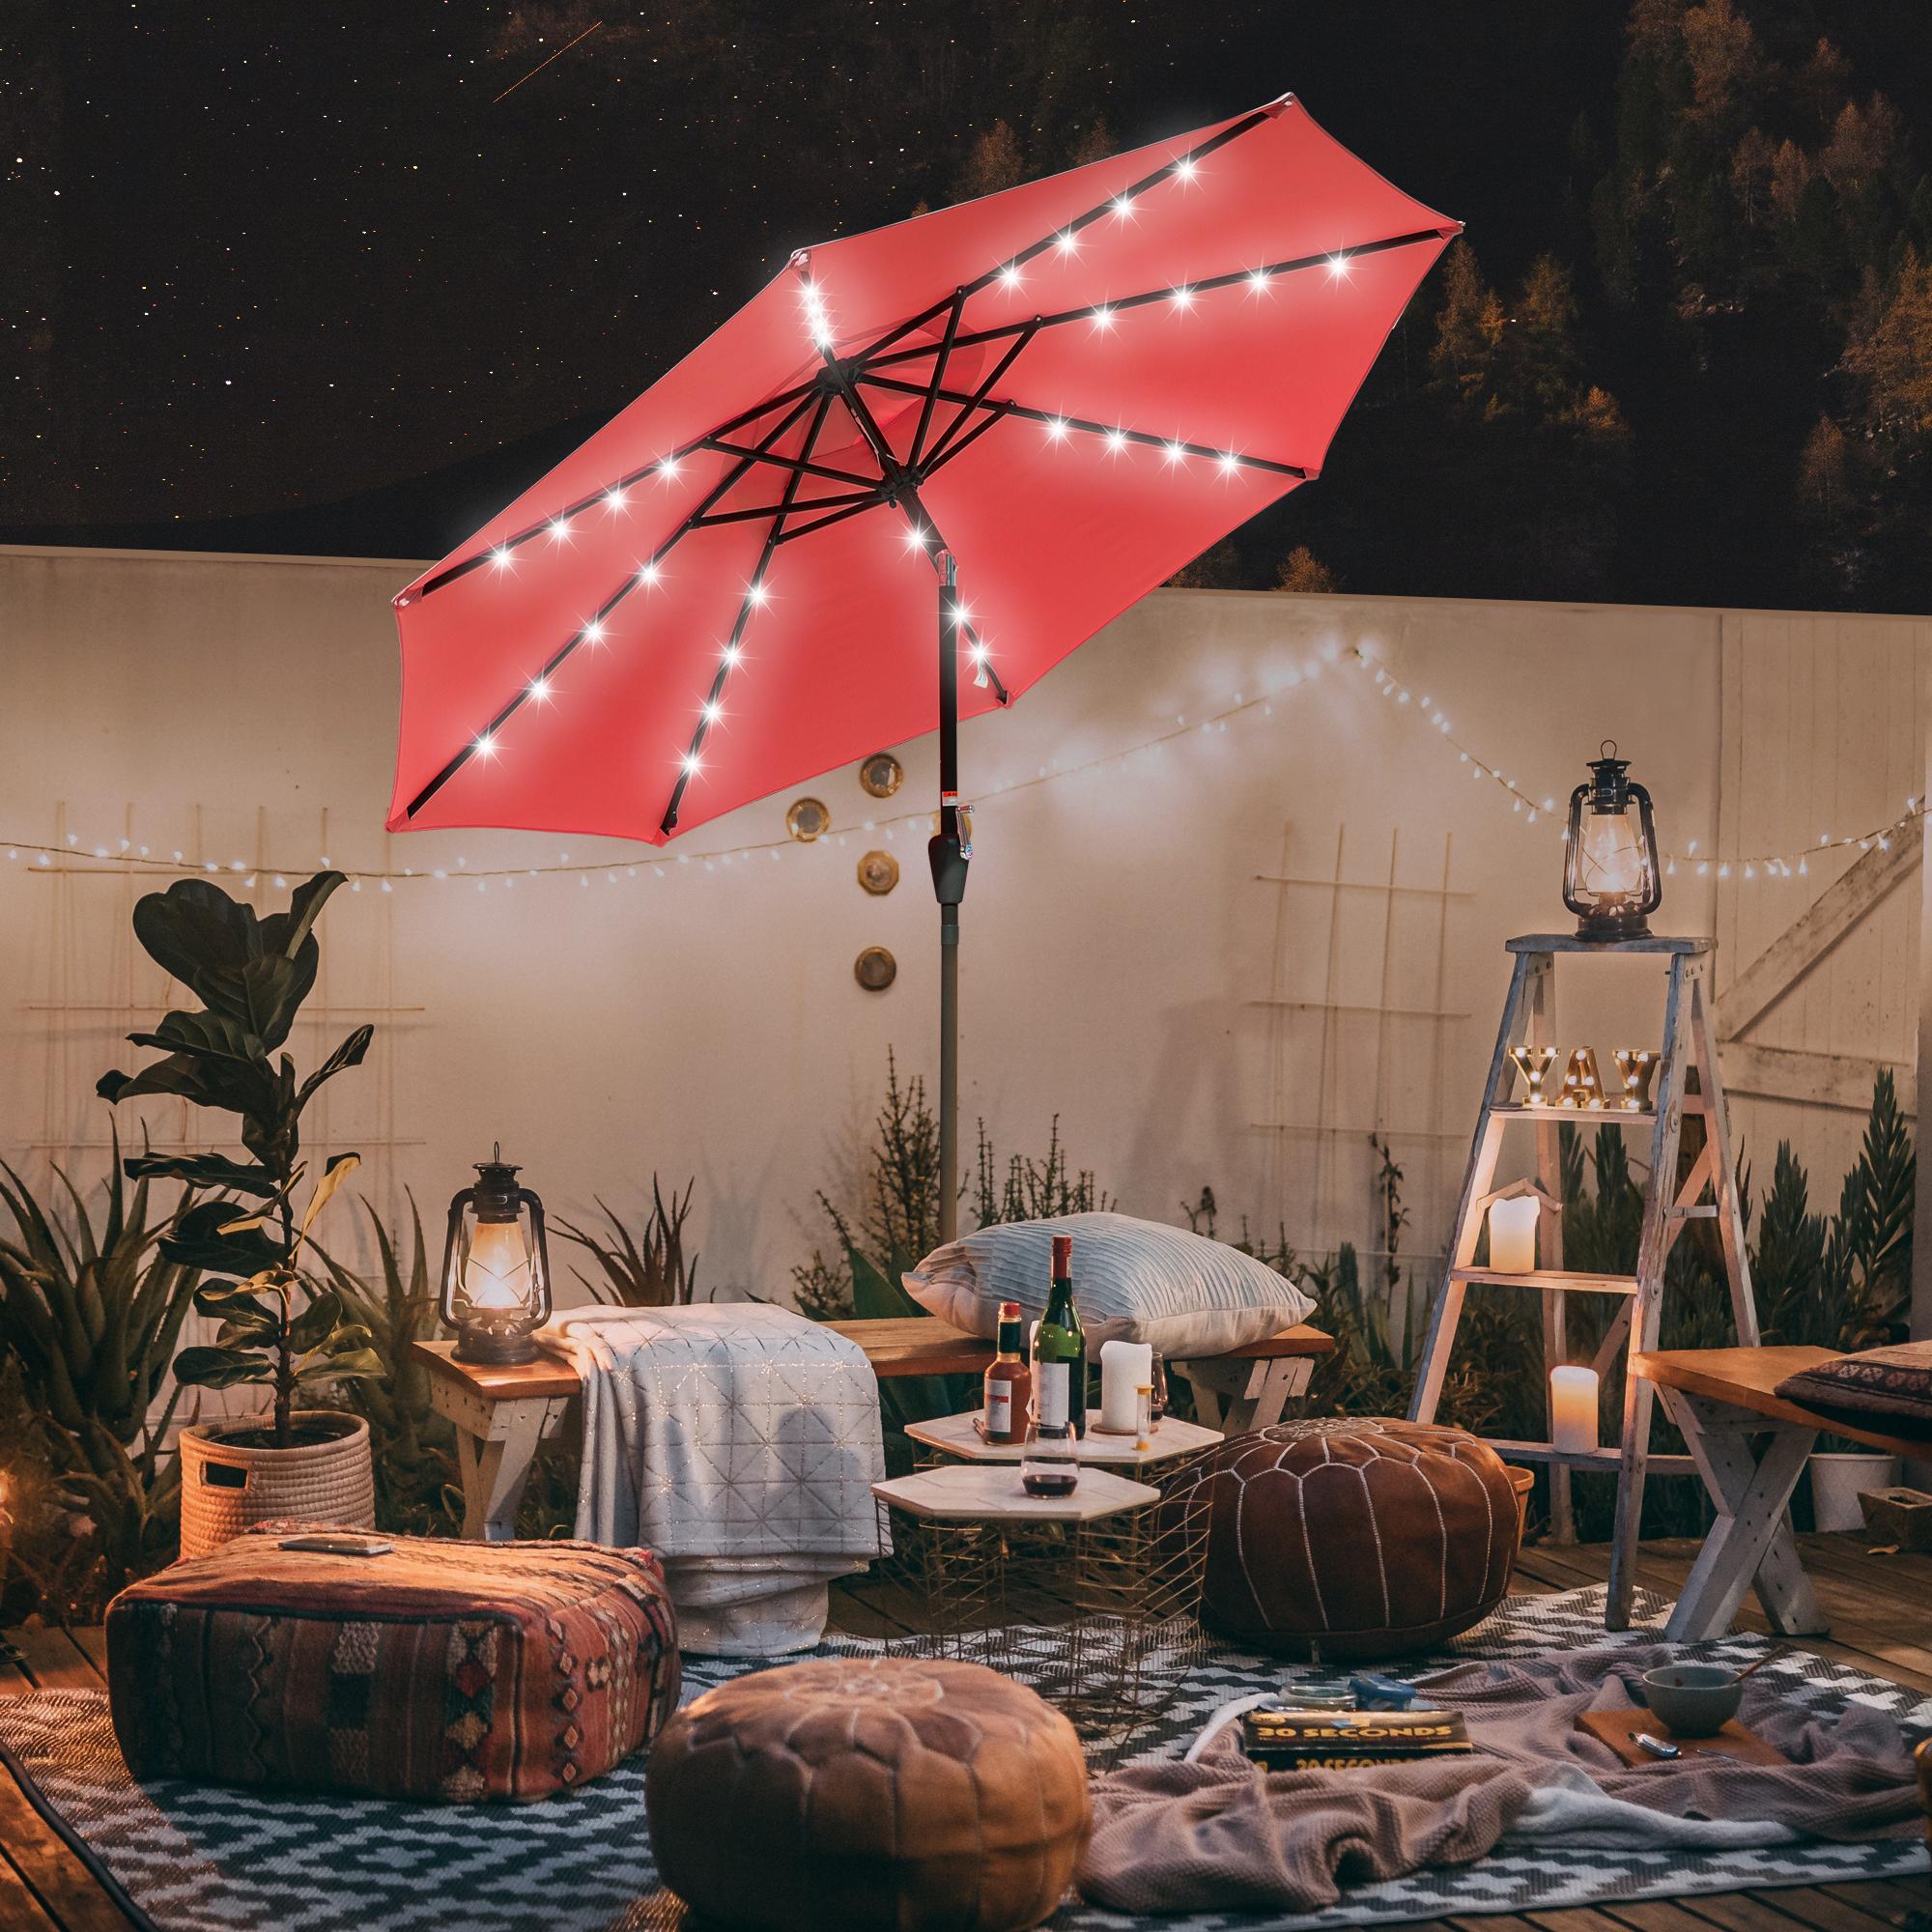 thumbnail 61 - 9' Patio Outdoor Umbrella Solar LED 8 Rib Garden Parasol Yard Deck Table Shade